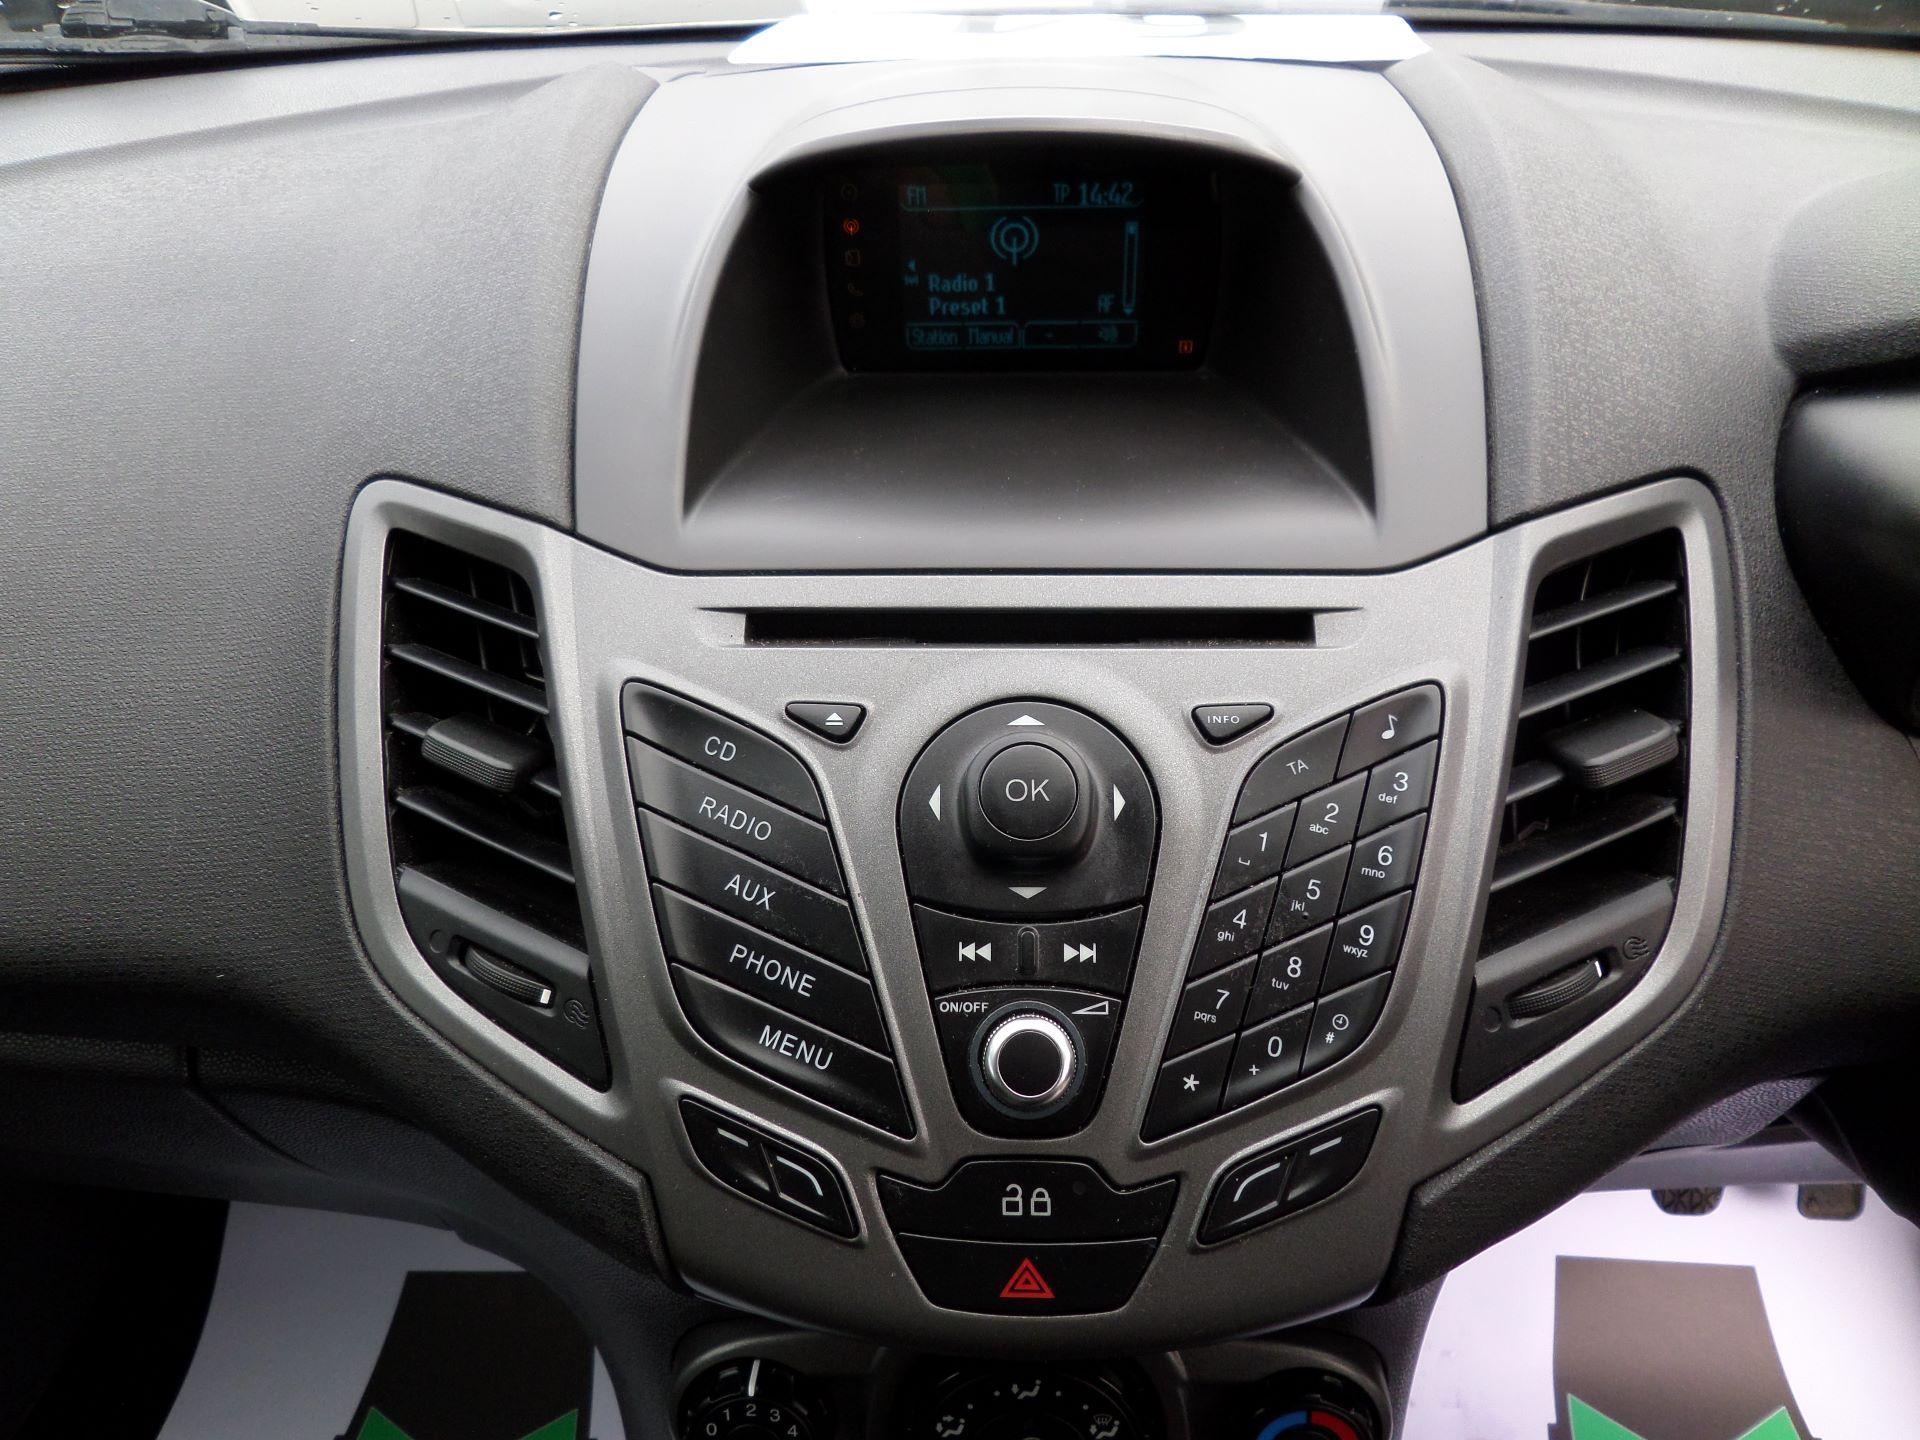 2014 Ford Fiesta 1.5 Tdci Van Euro 5 (NJ64MXZ) Image 3